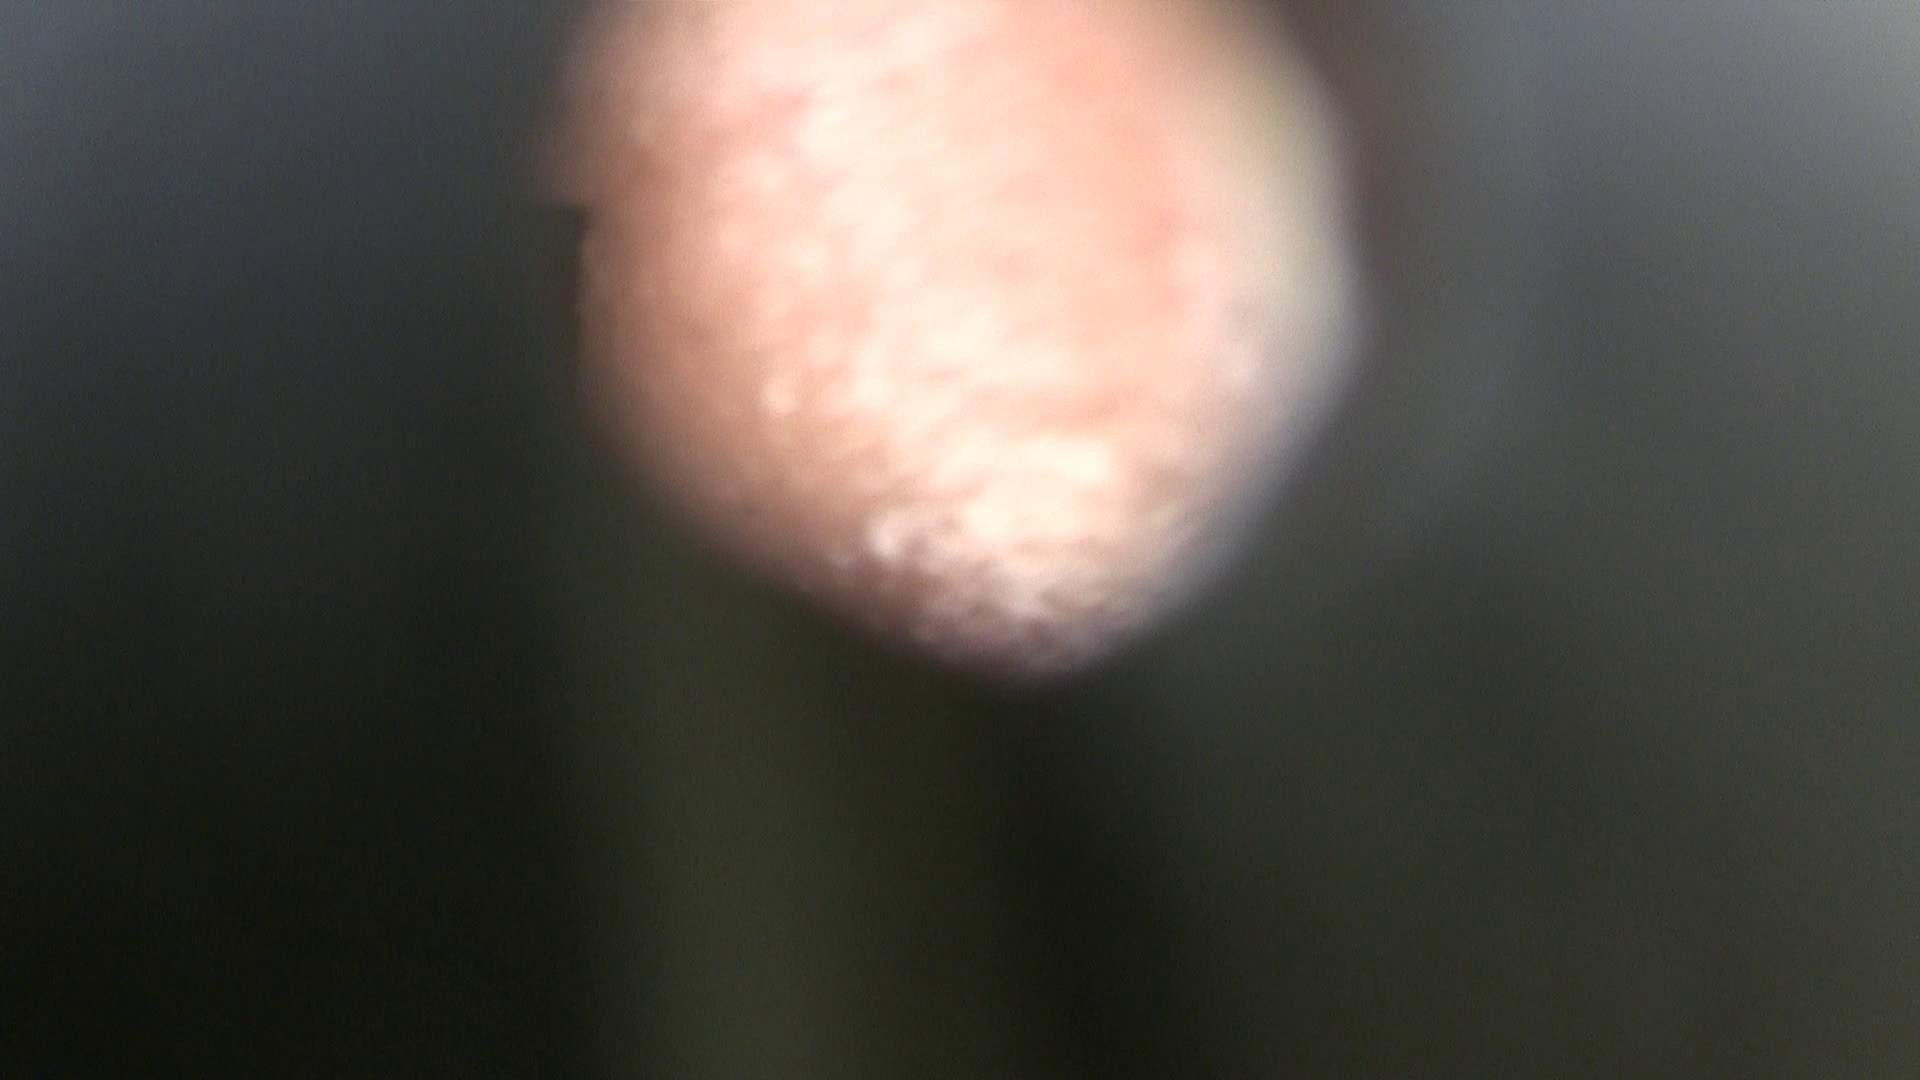 NO.10 小さな穴から一本道を狙う!! シャワー室 ワレメ無修正動画無料 99枚 67